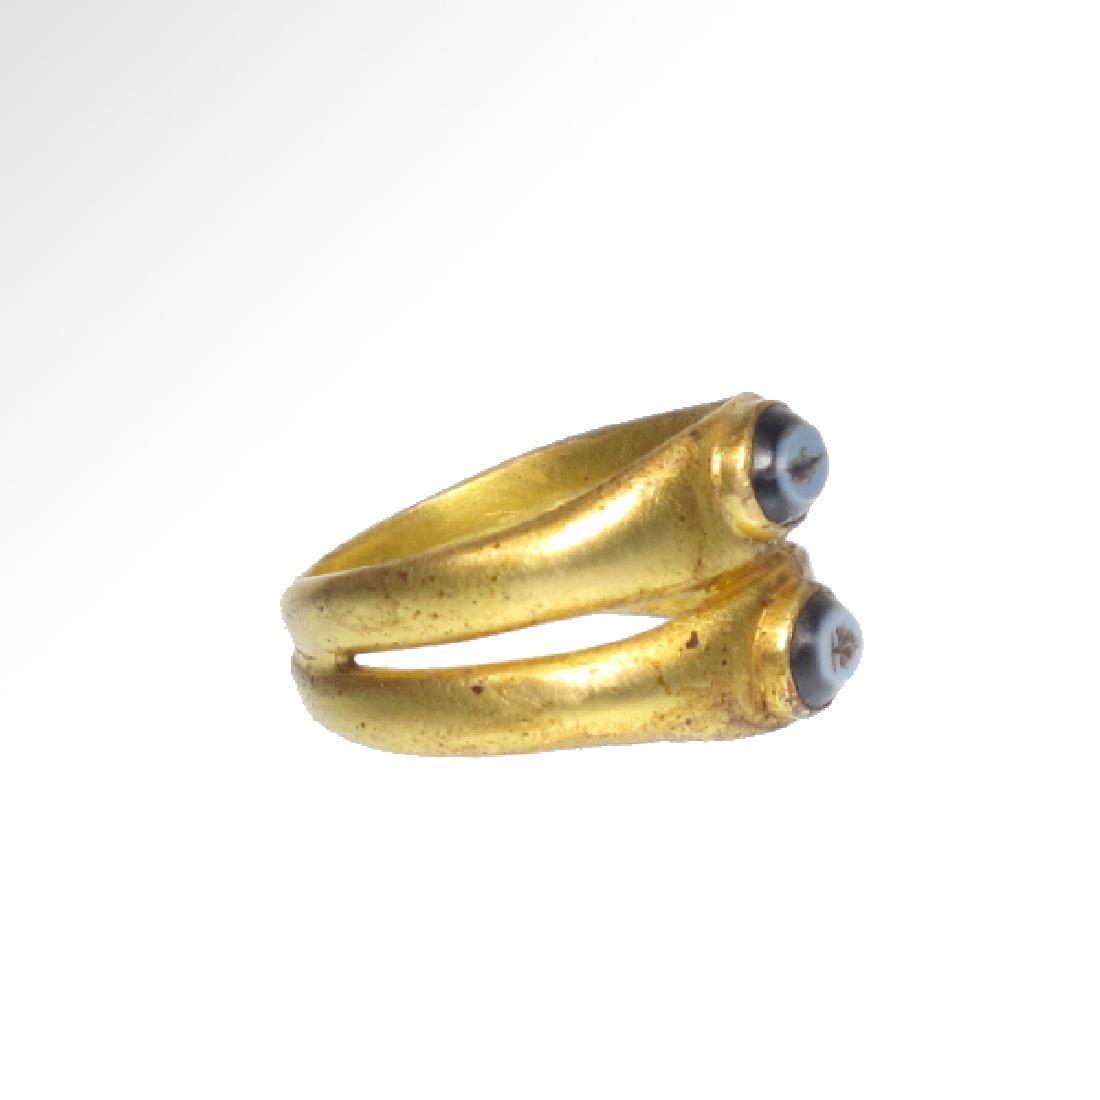 Roman Gold Double Ring, Onyx Intaglios, c. 2nd Century - 4